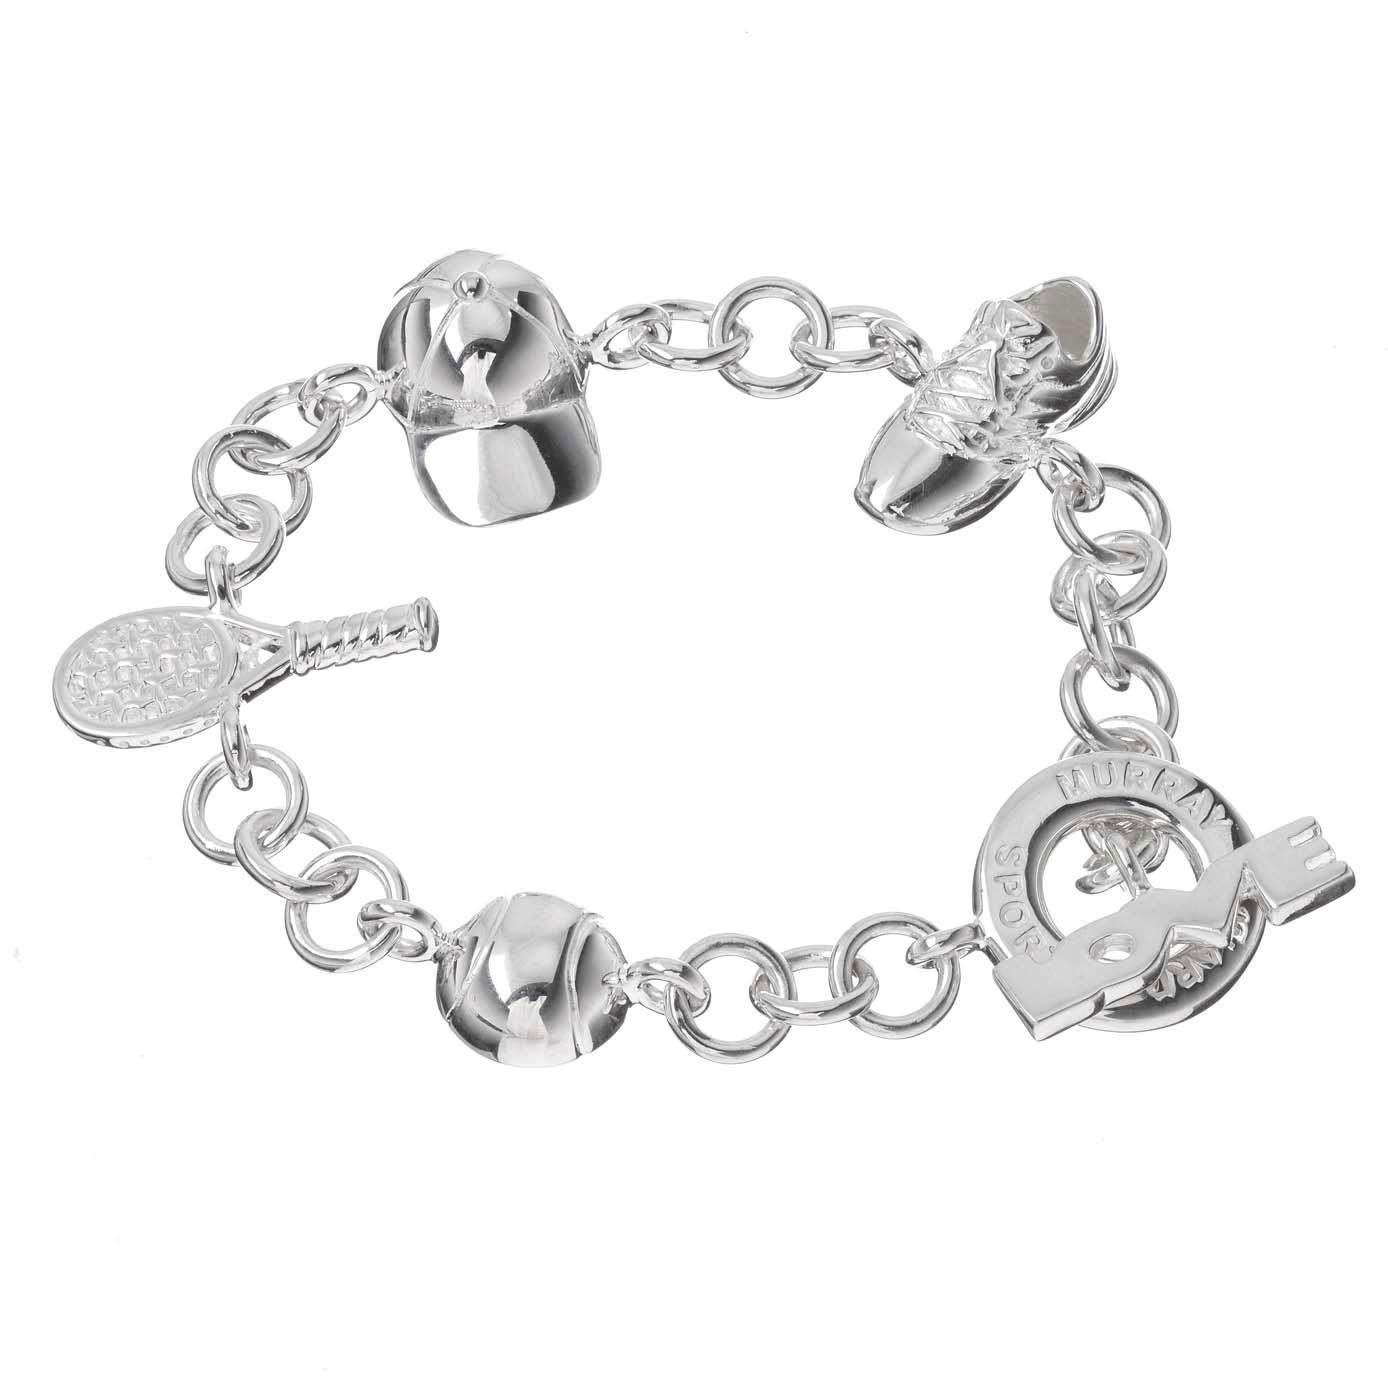 Tennis Charm Bracelet: Sterling Silver Tennis Charm Bracelet